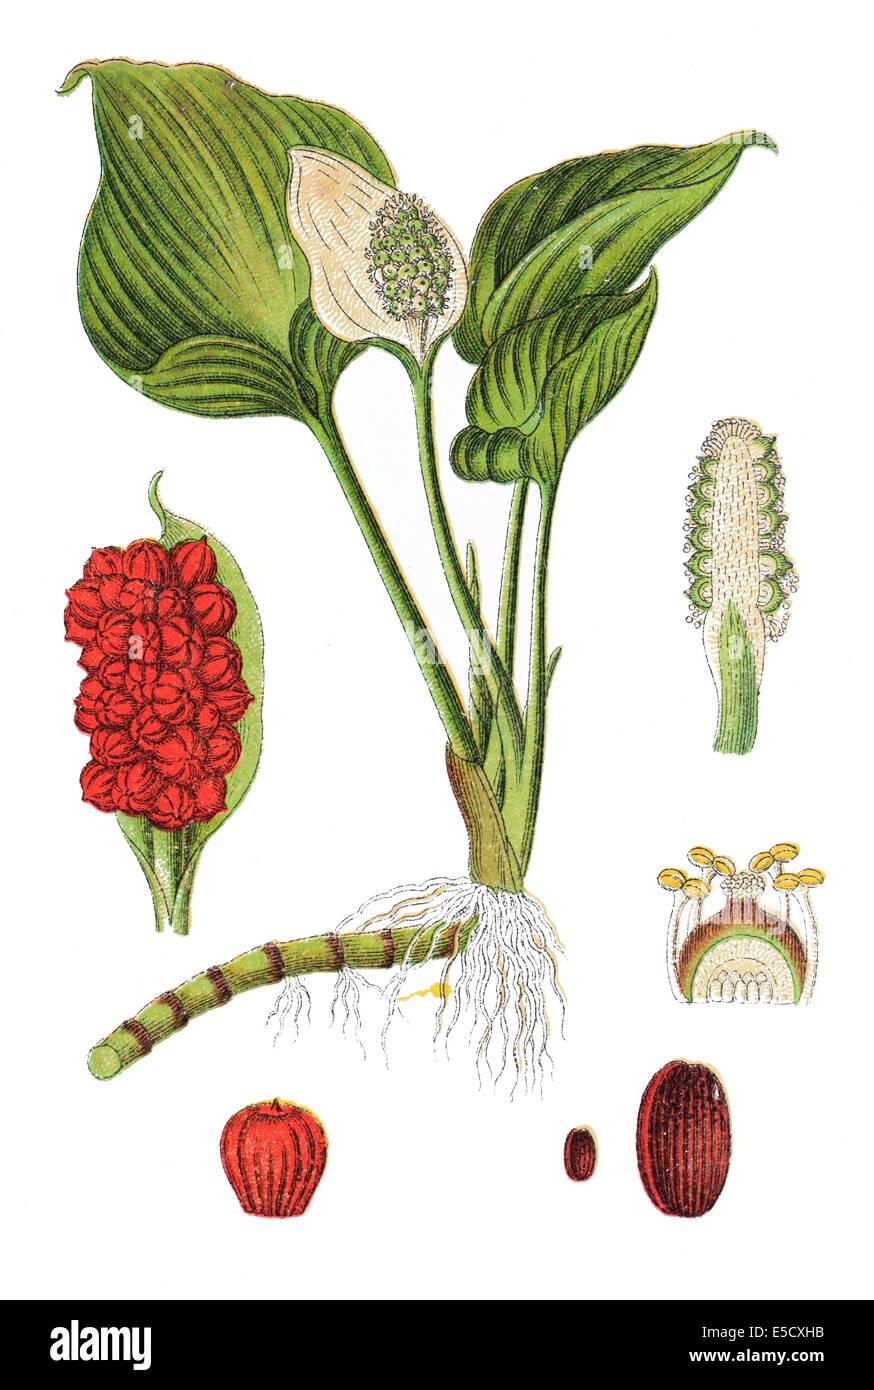 Calla palustris, Bog Arum, Marsh Calla, Wild Calla, and Water-arum - Stock Image